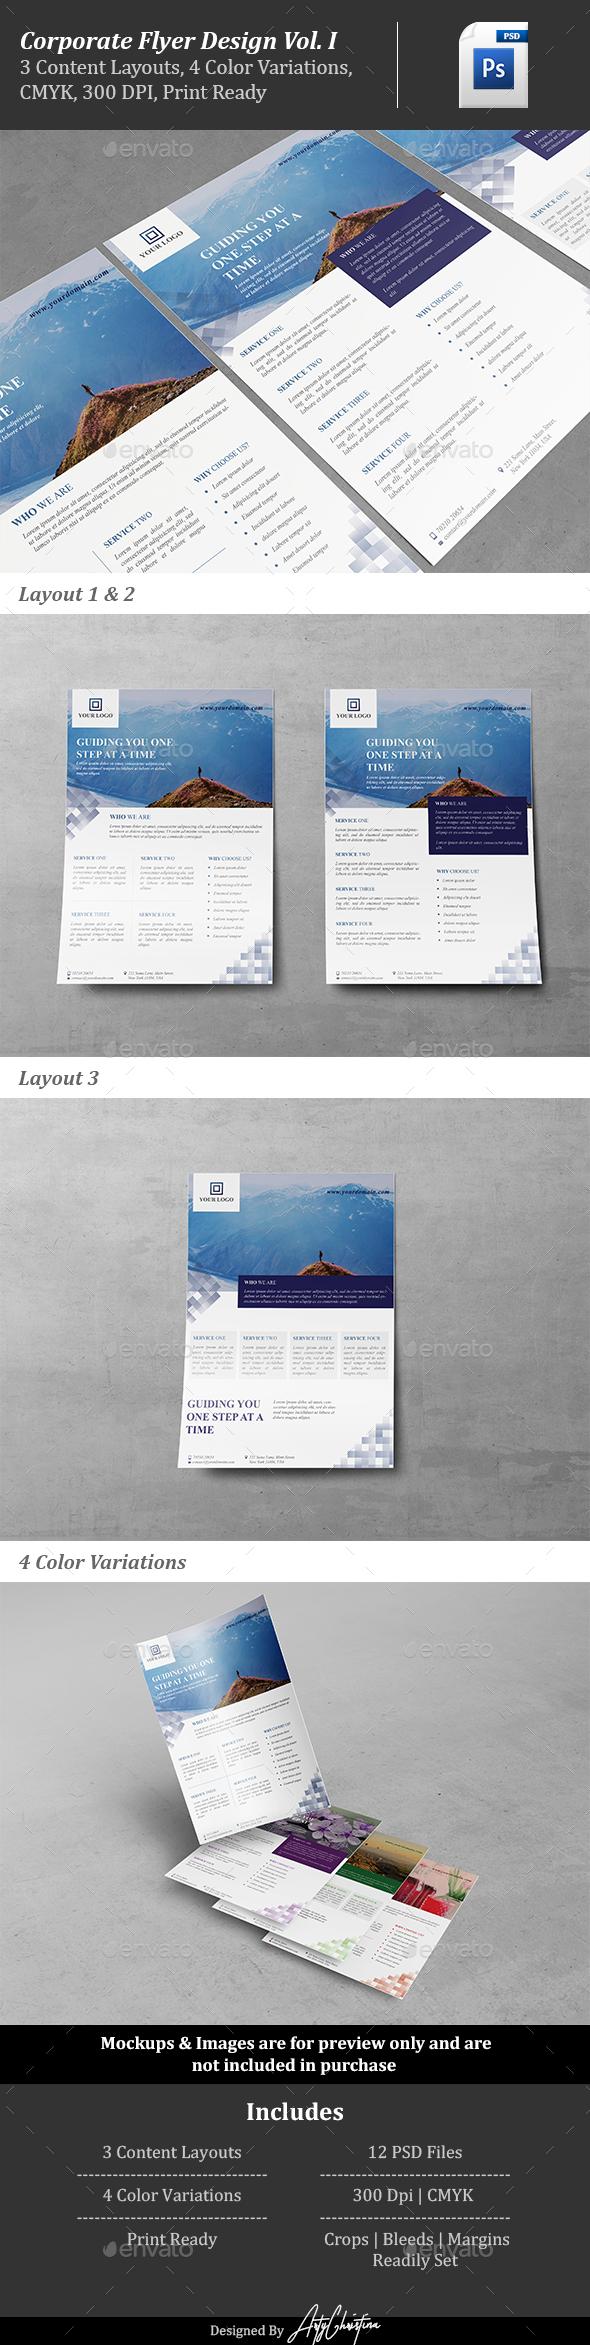 Corporate Flyer Design Vol. 1 - Corporate Flyers